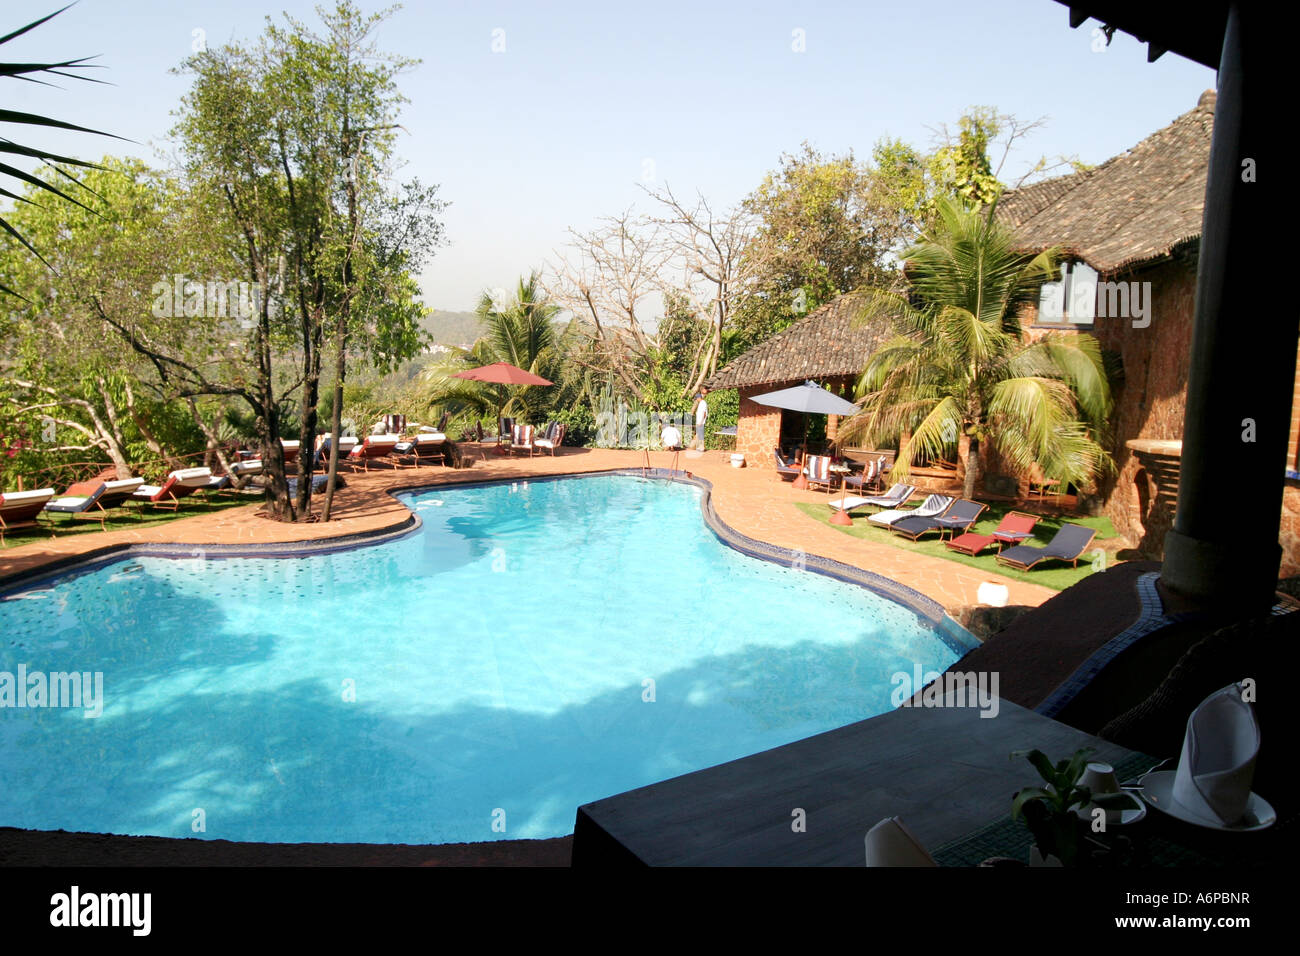 Spettacolare area piscina nel designer Nilaya Hermitage boutique hotel in Goa in India Immagini Stock